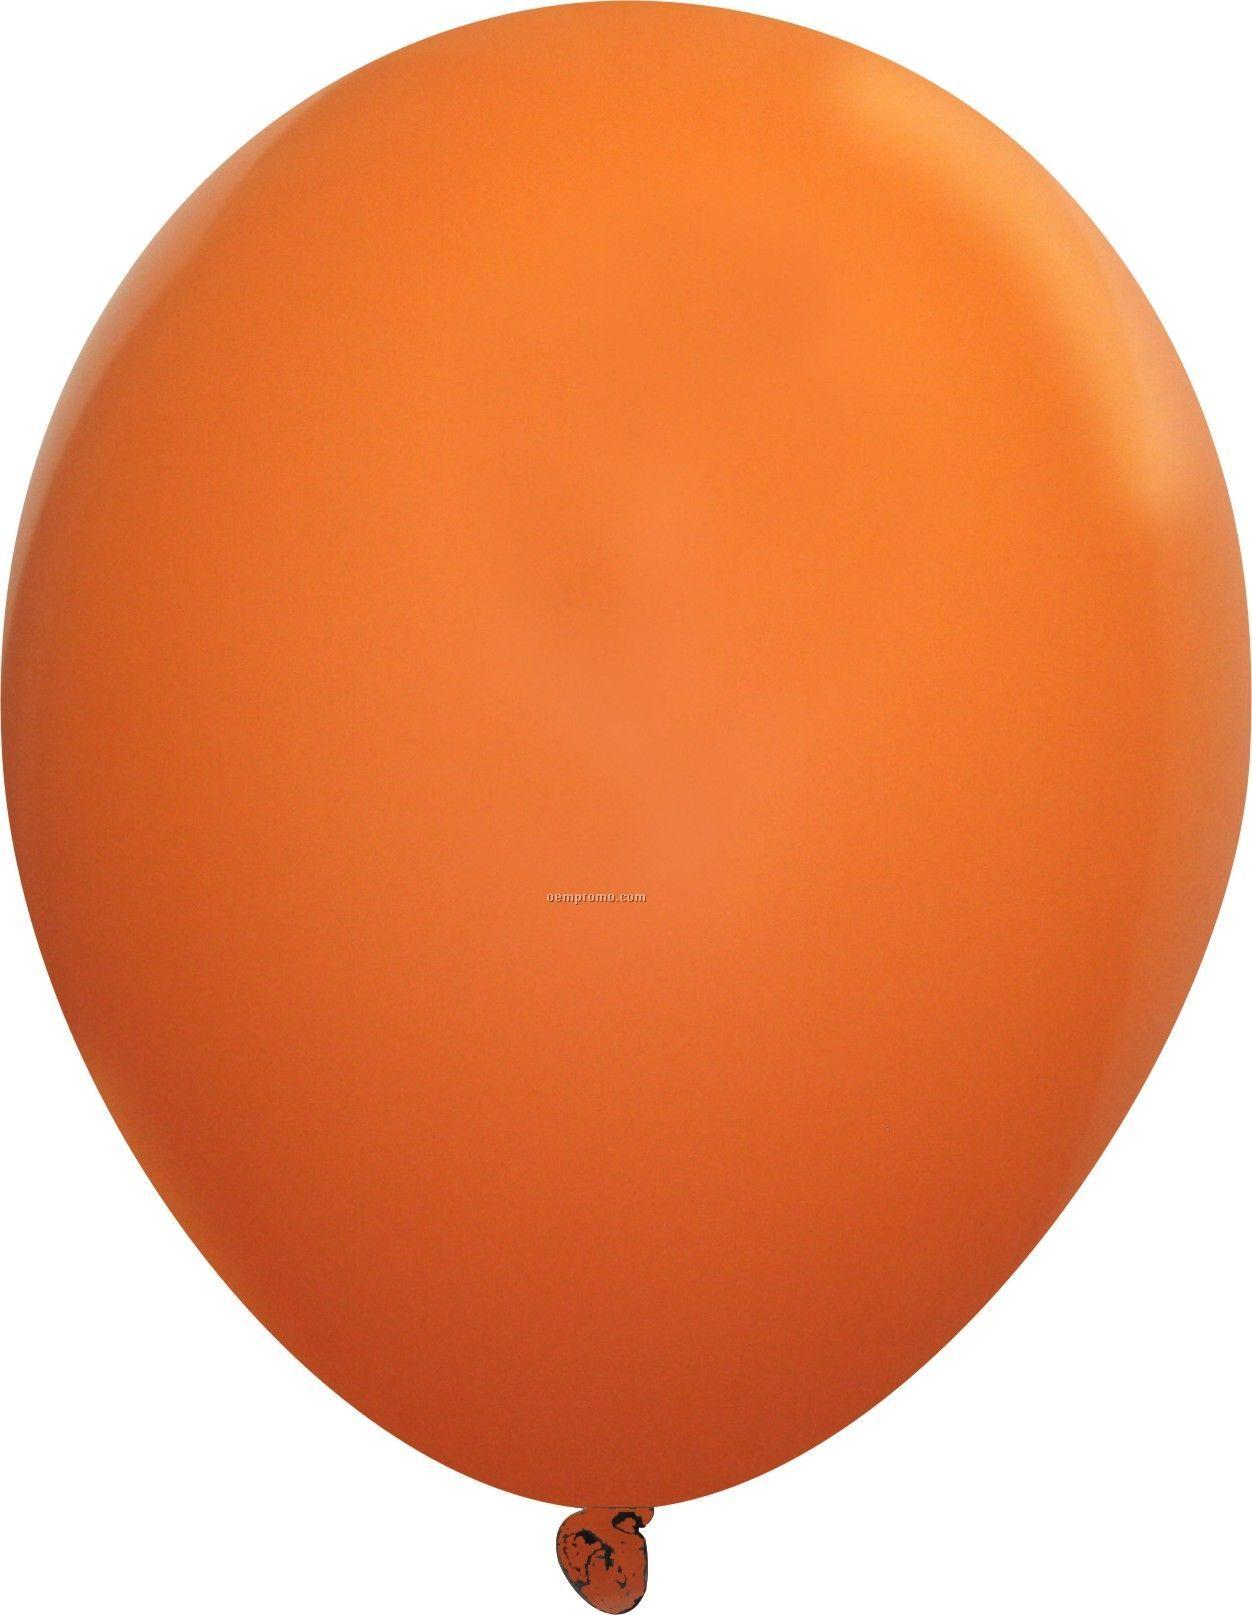 Unimprinted Jumbo Latex Balloons 72 15622